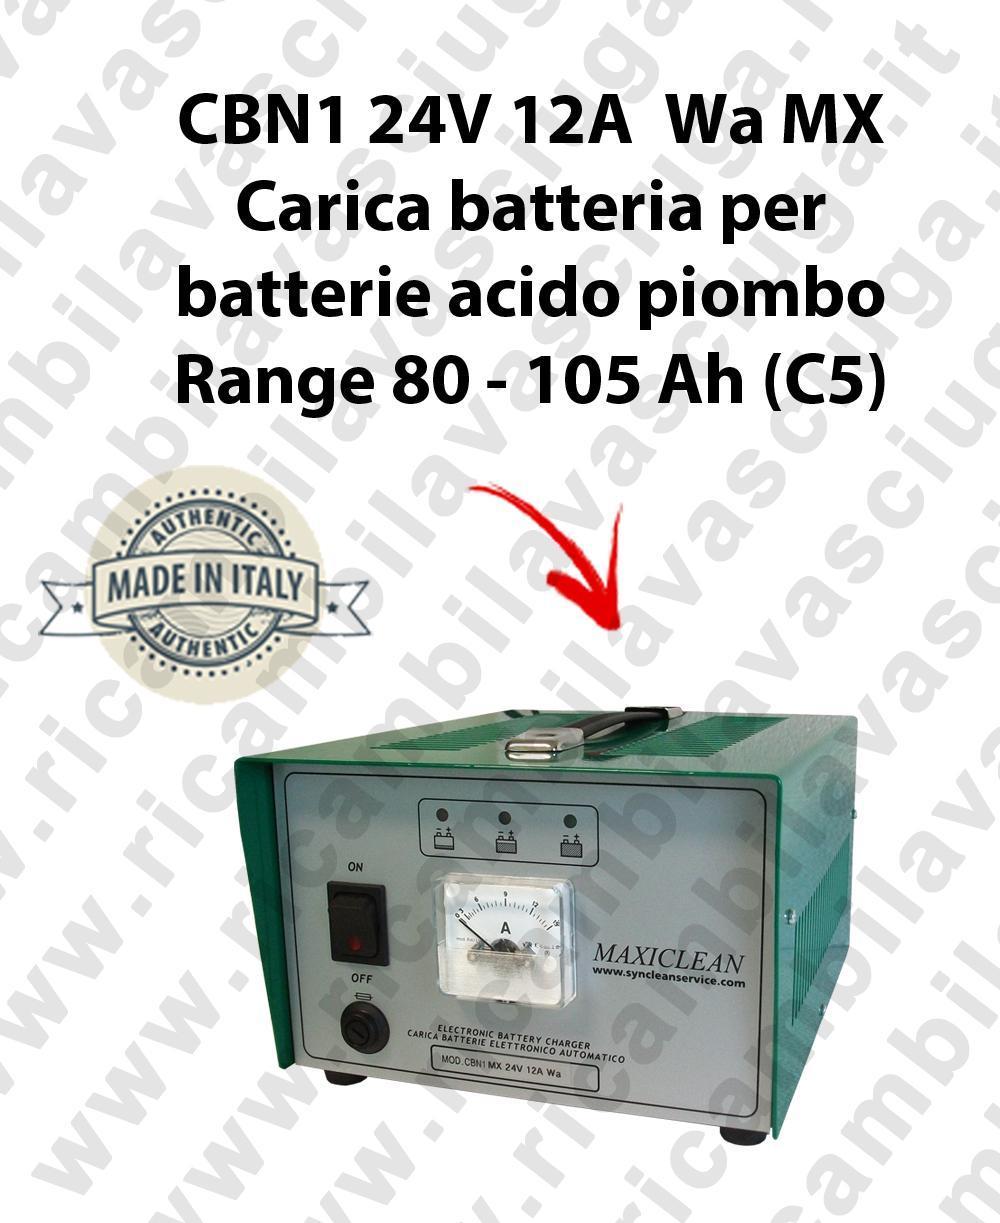 CBN1 24V 12A Wa MX carica batterie para batterie acido piombo